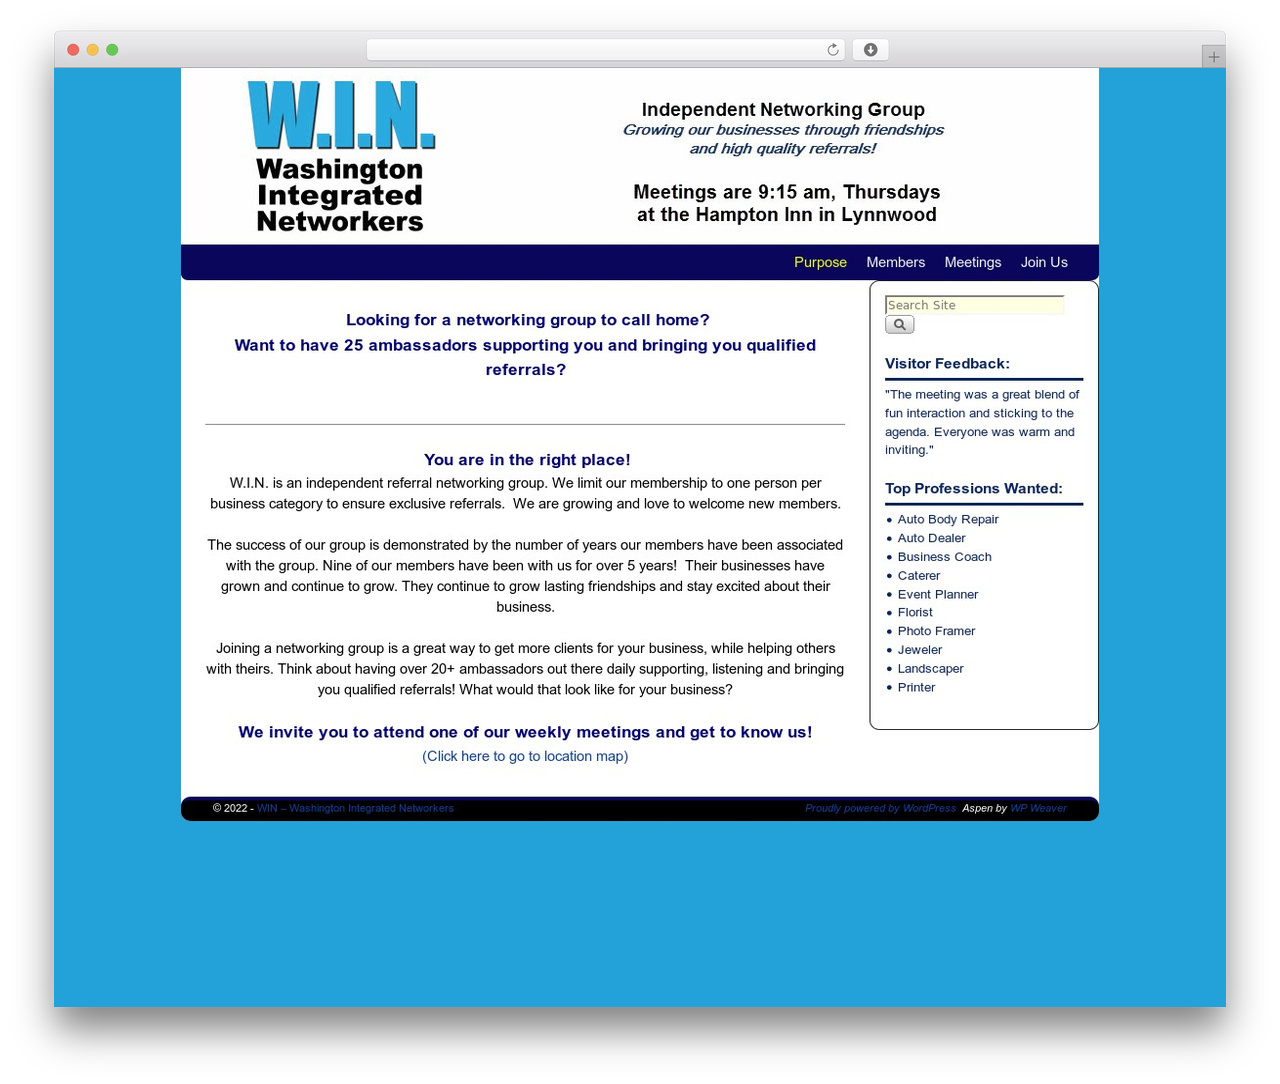 Aspen Wordpress Template For Business By Bruce Wampler Win